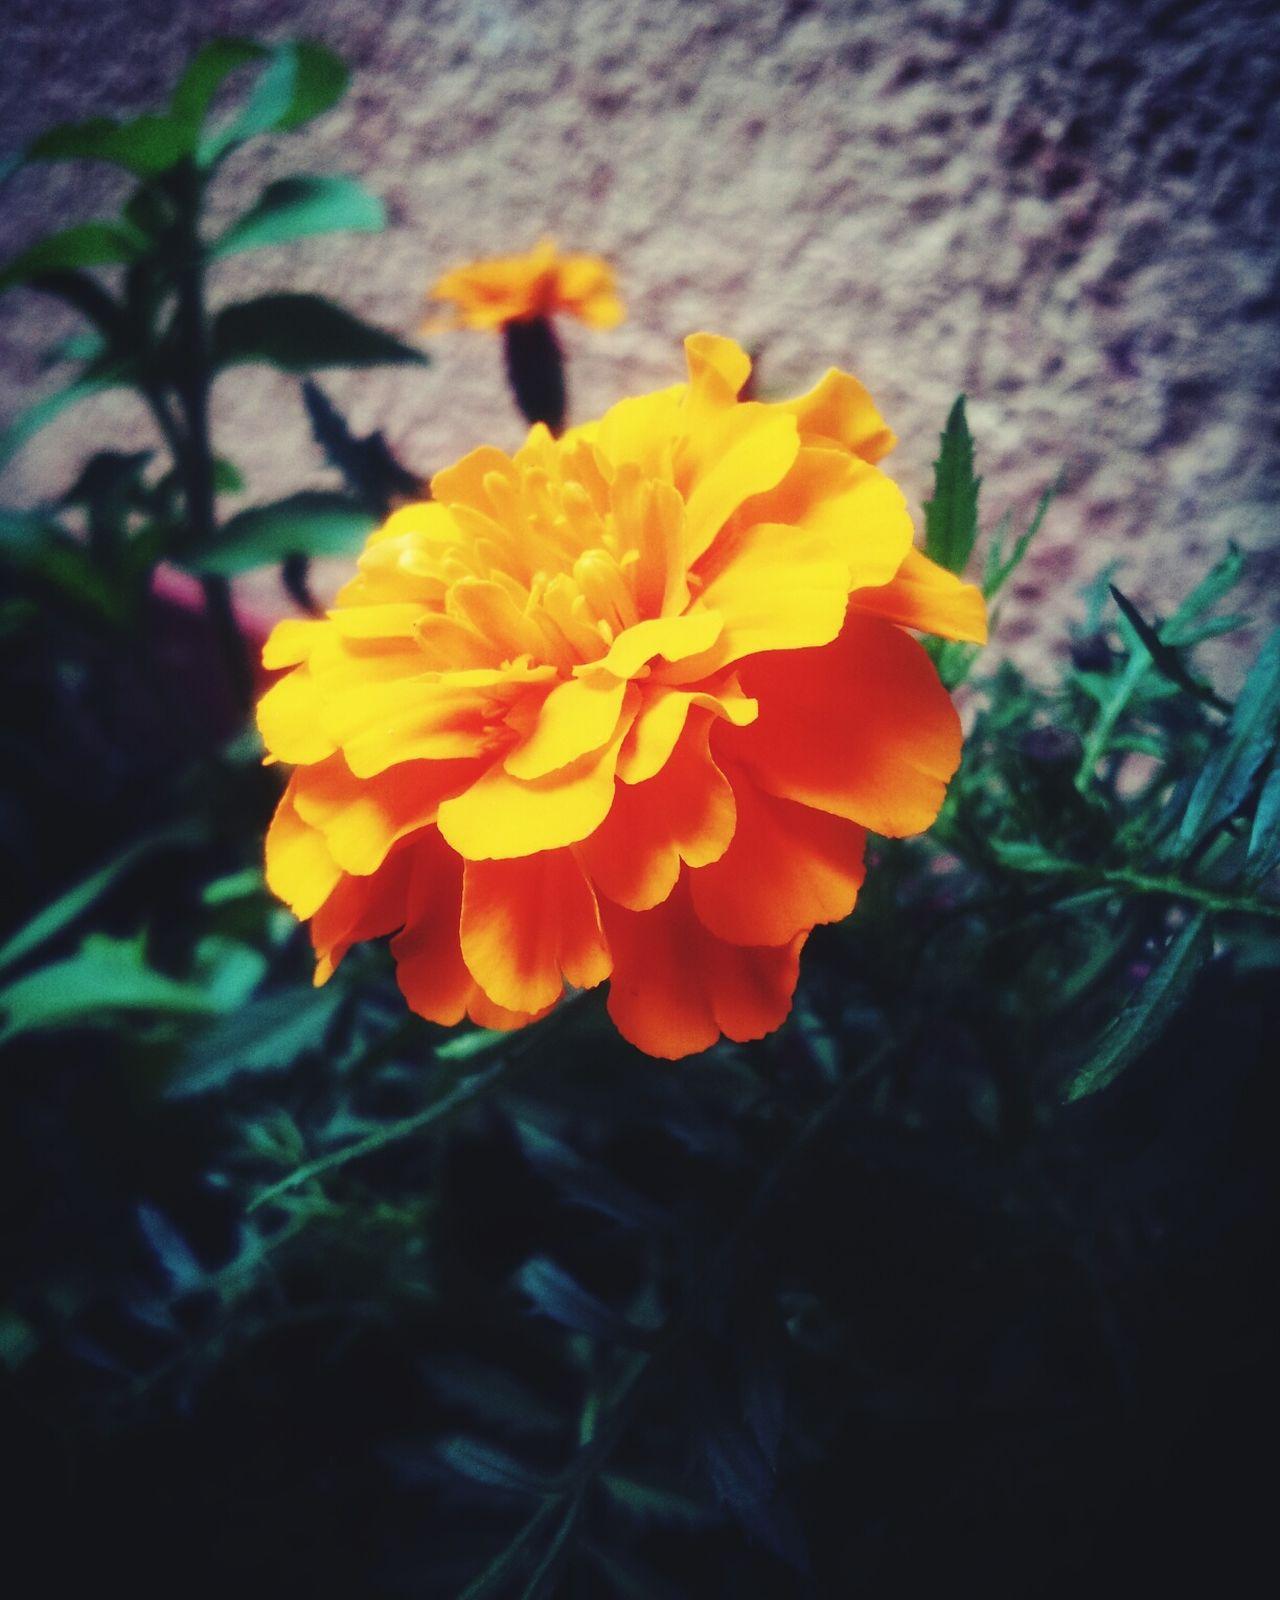 La belleza en naranjo (=^--^) Orange Flower Simple Nature Justlikethat Beautiful Flor Caminando Belleza